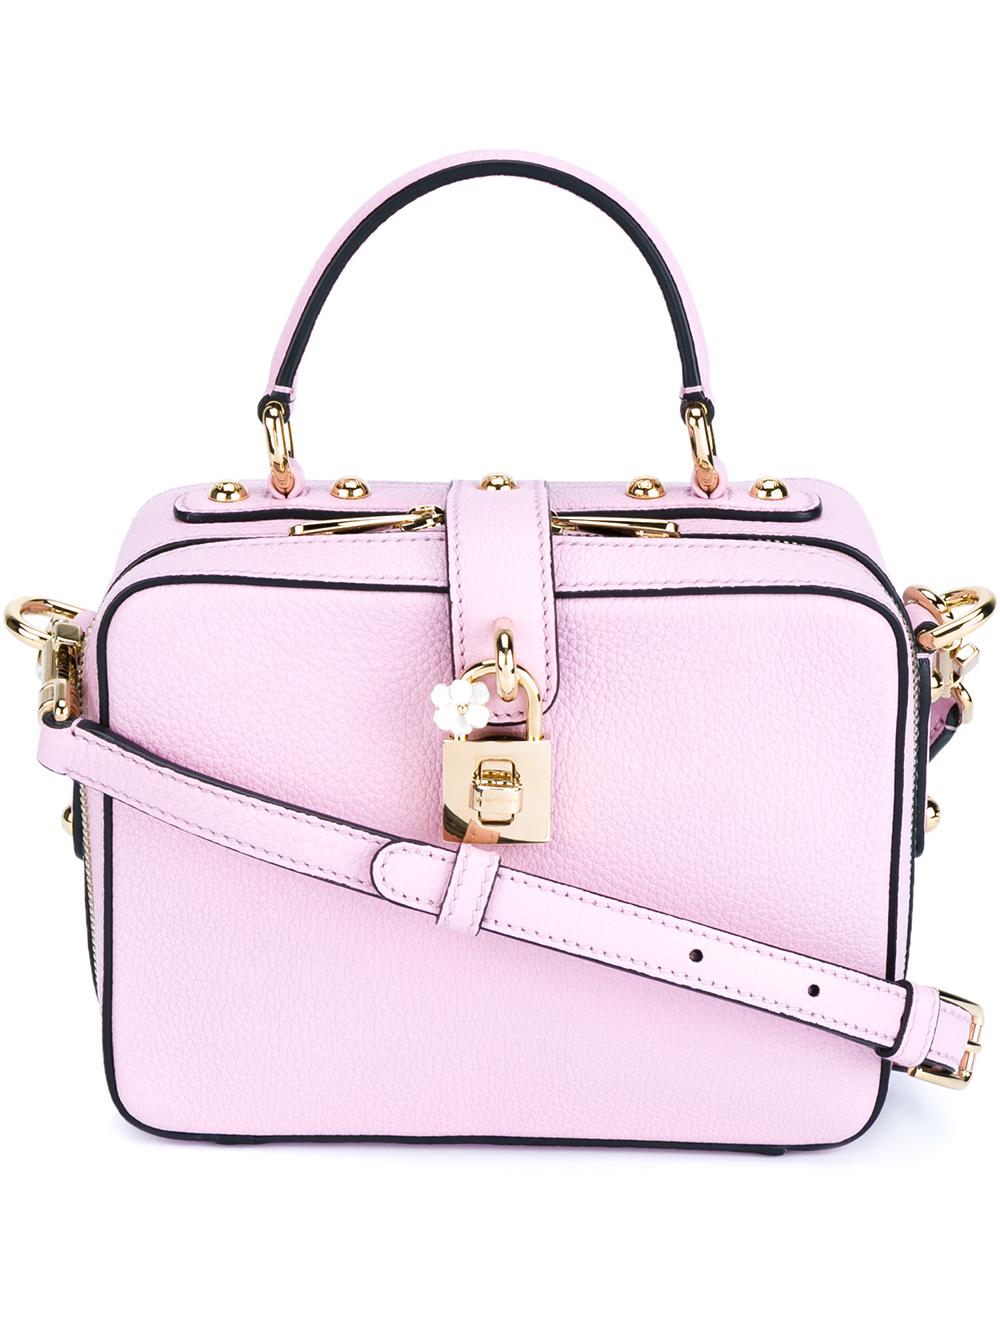 c58383bd43b5 Lyst - Dolce   Gabbana Lock Embellished Box Bag in Pink